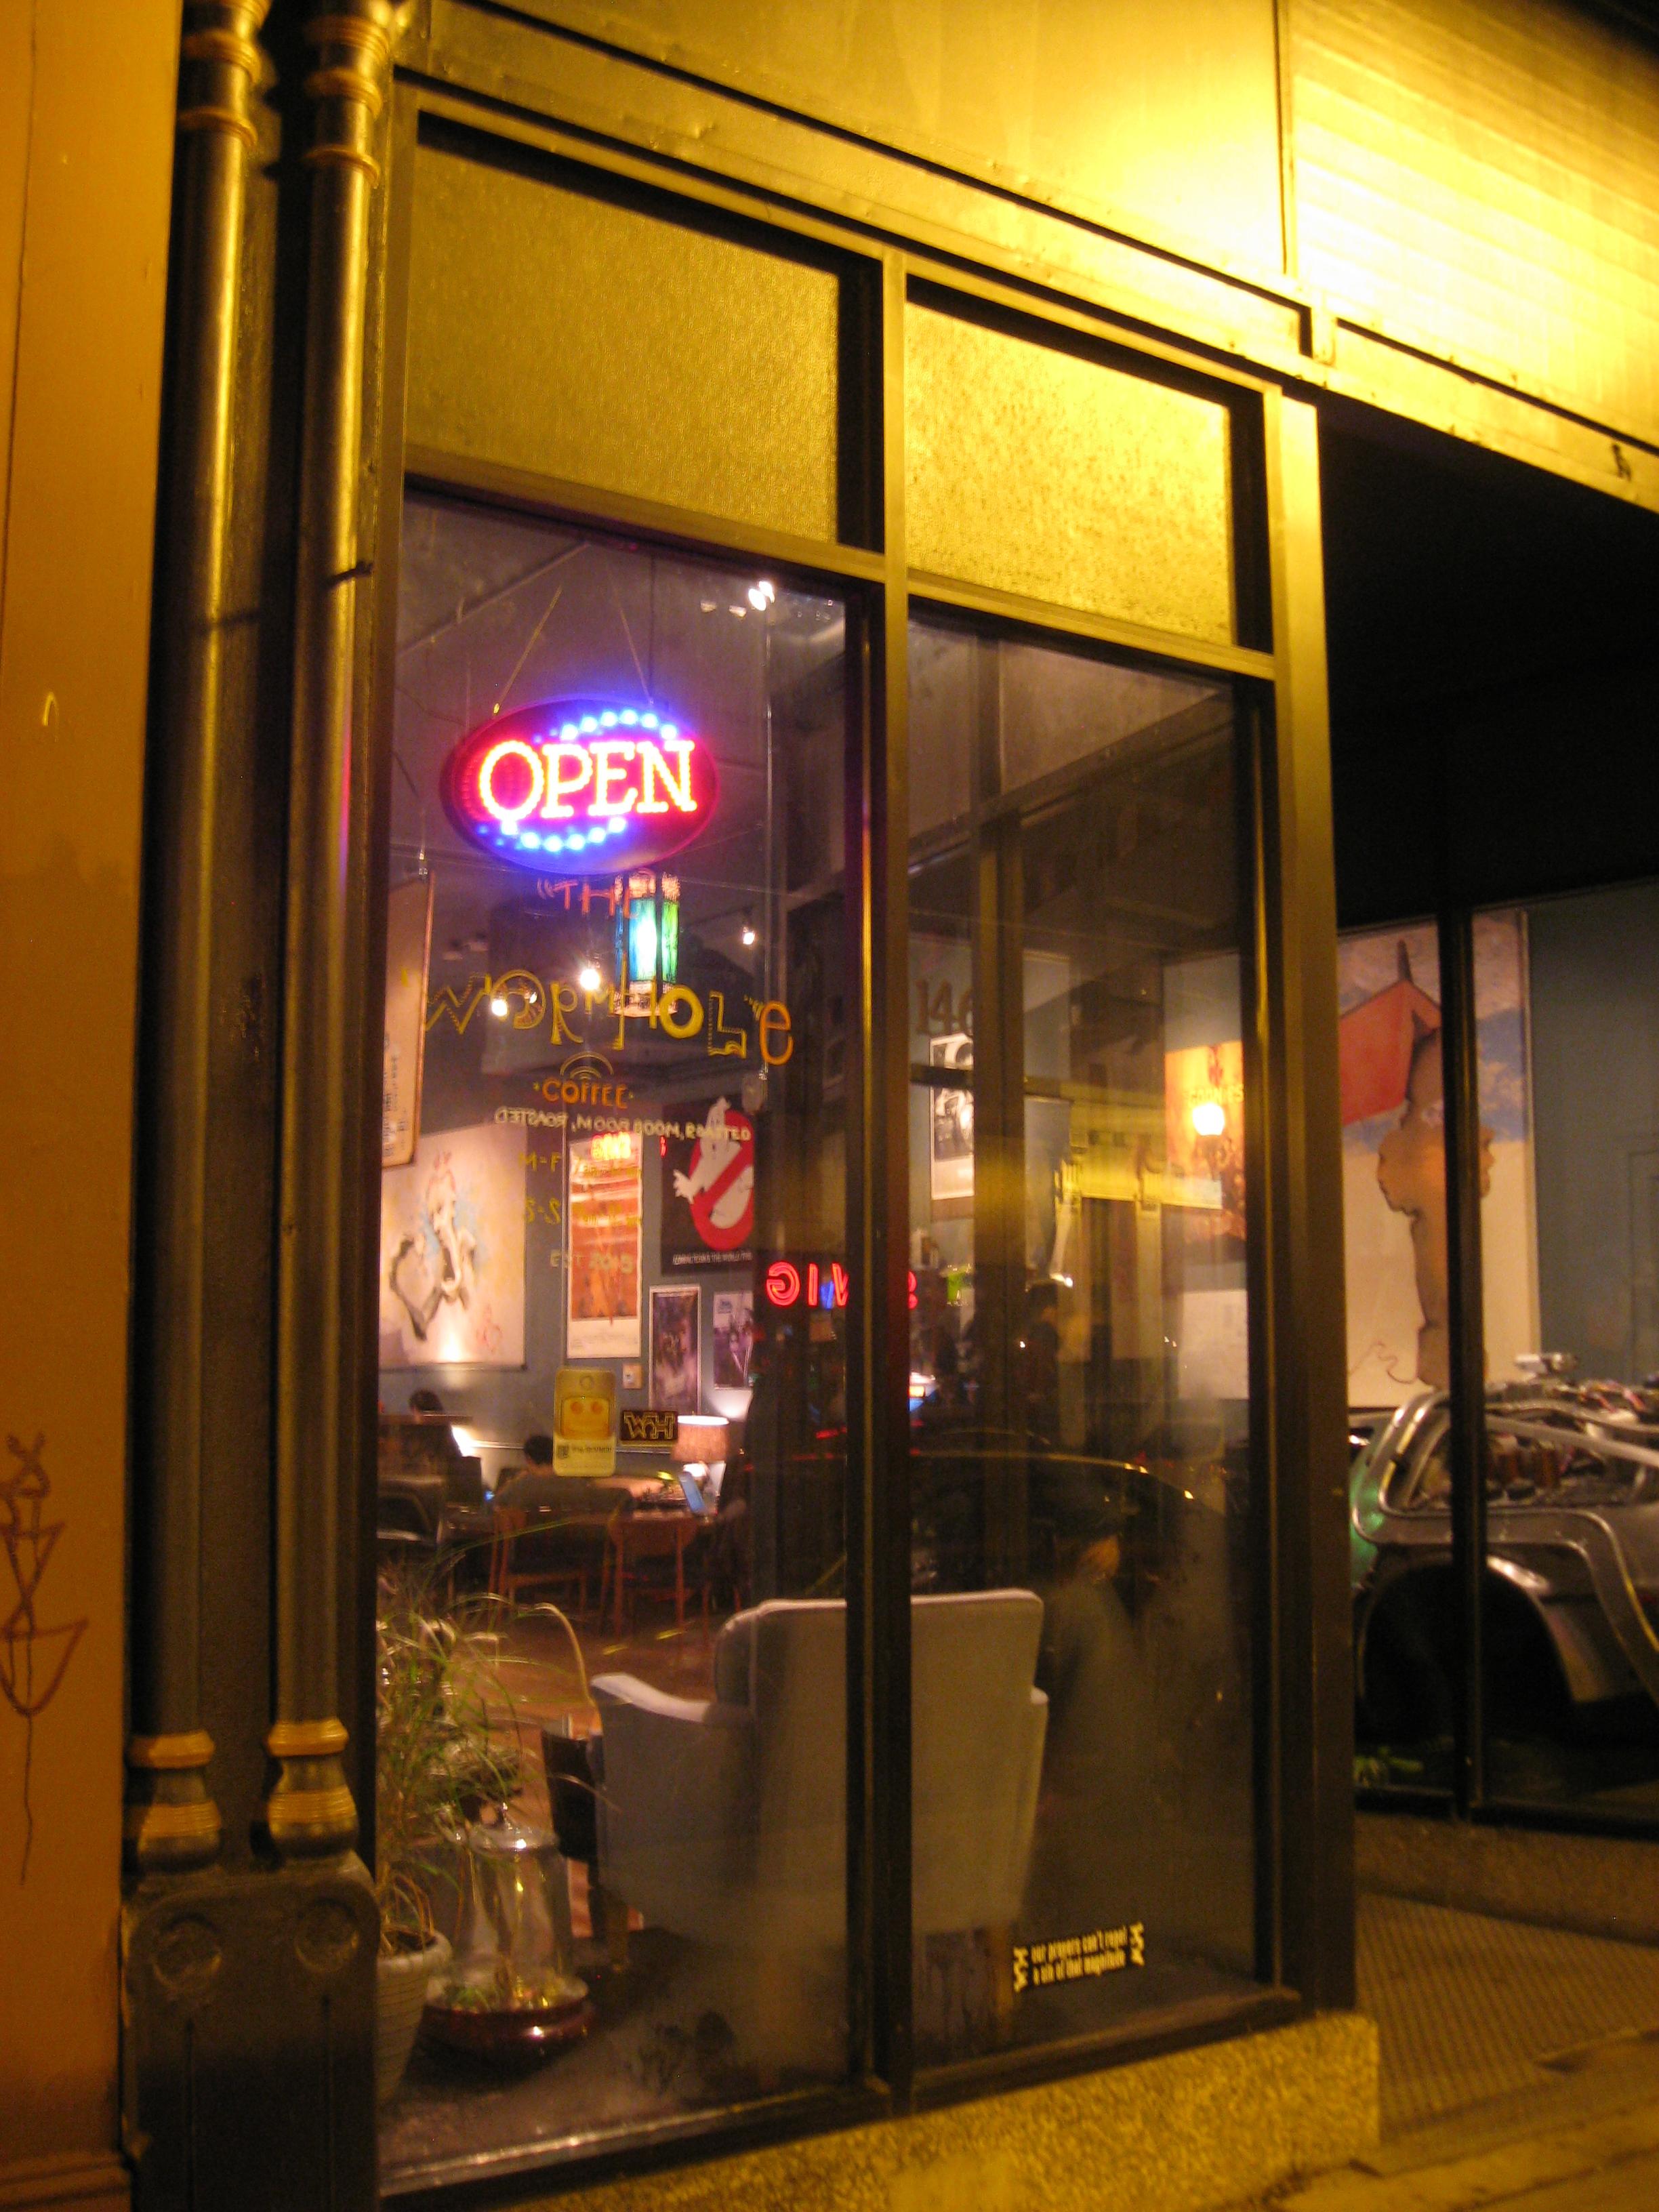 Wormhole Coffee, Wicker Park, Chicago, Illinois, Post-Gayborhoods